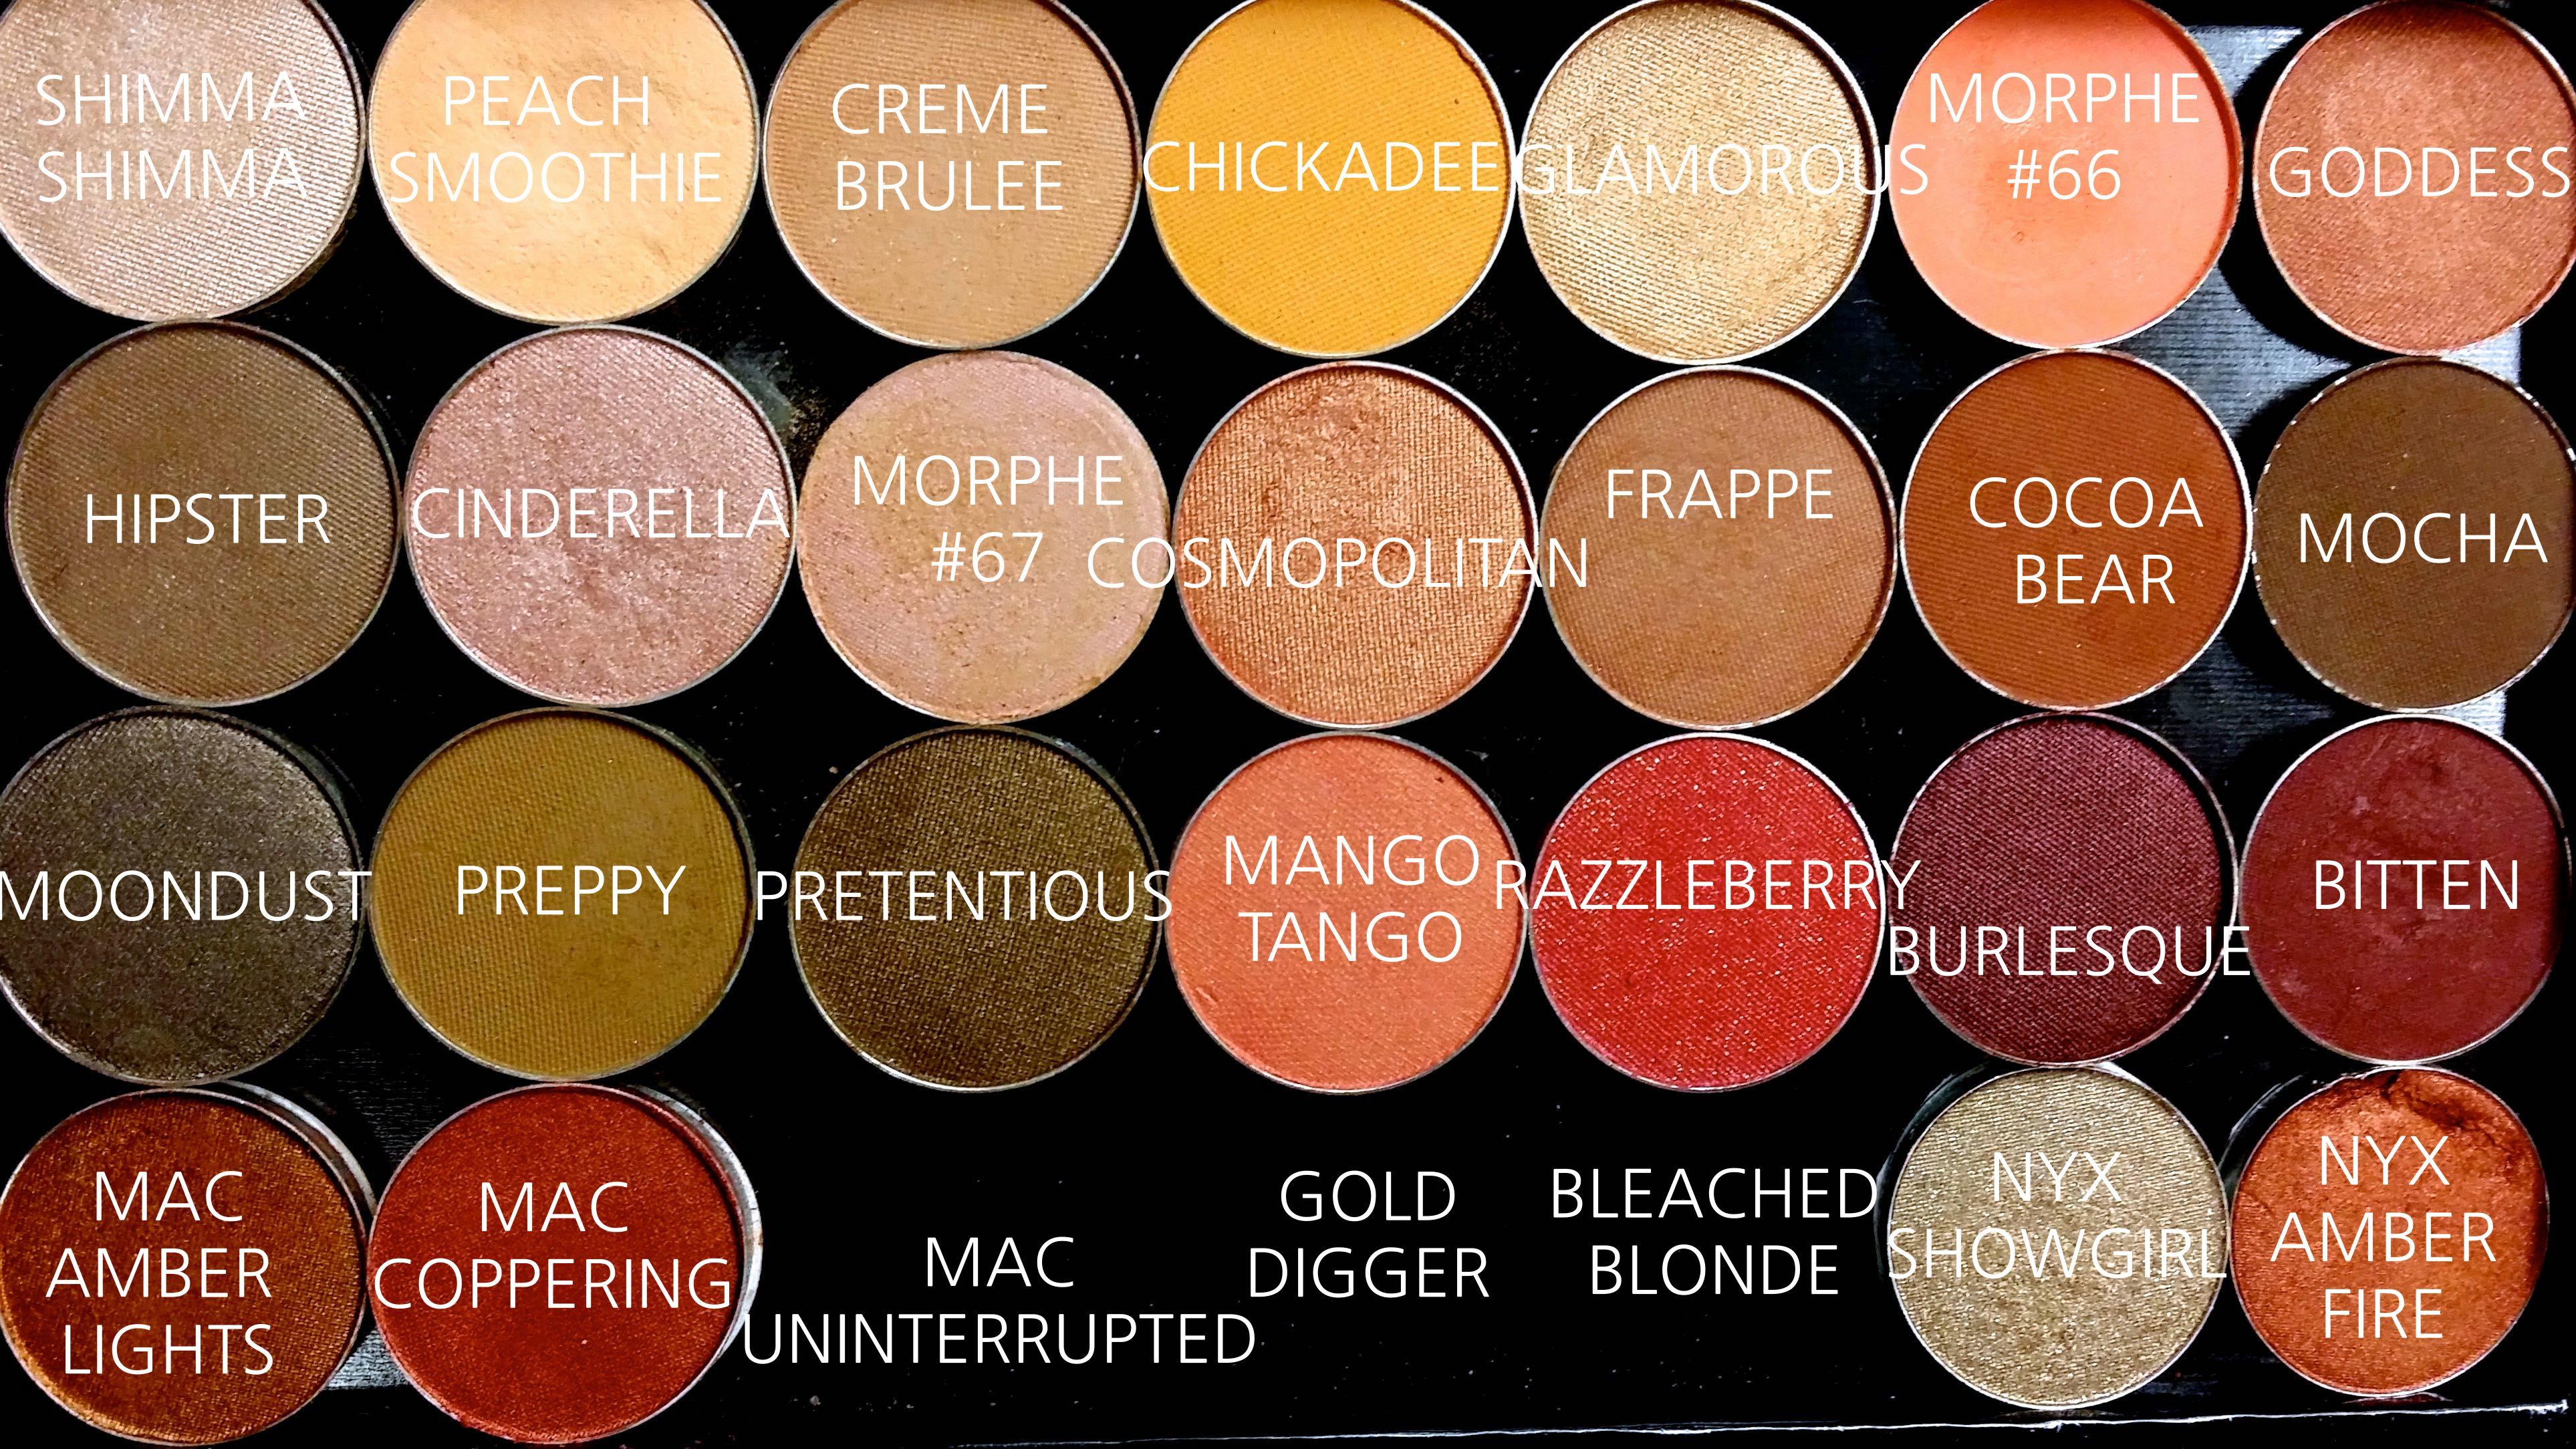 custom palette featuring makeupgeek, mac, nyx, and morphe